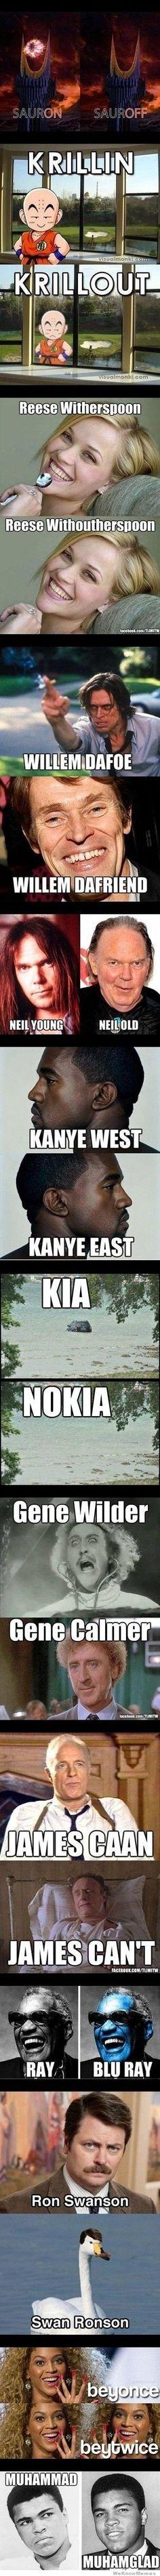 Meme puns!